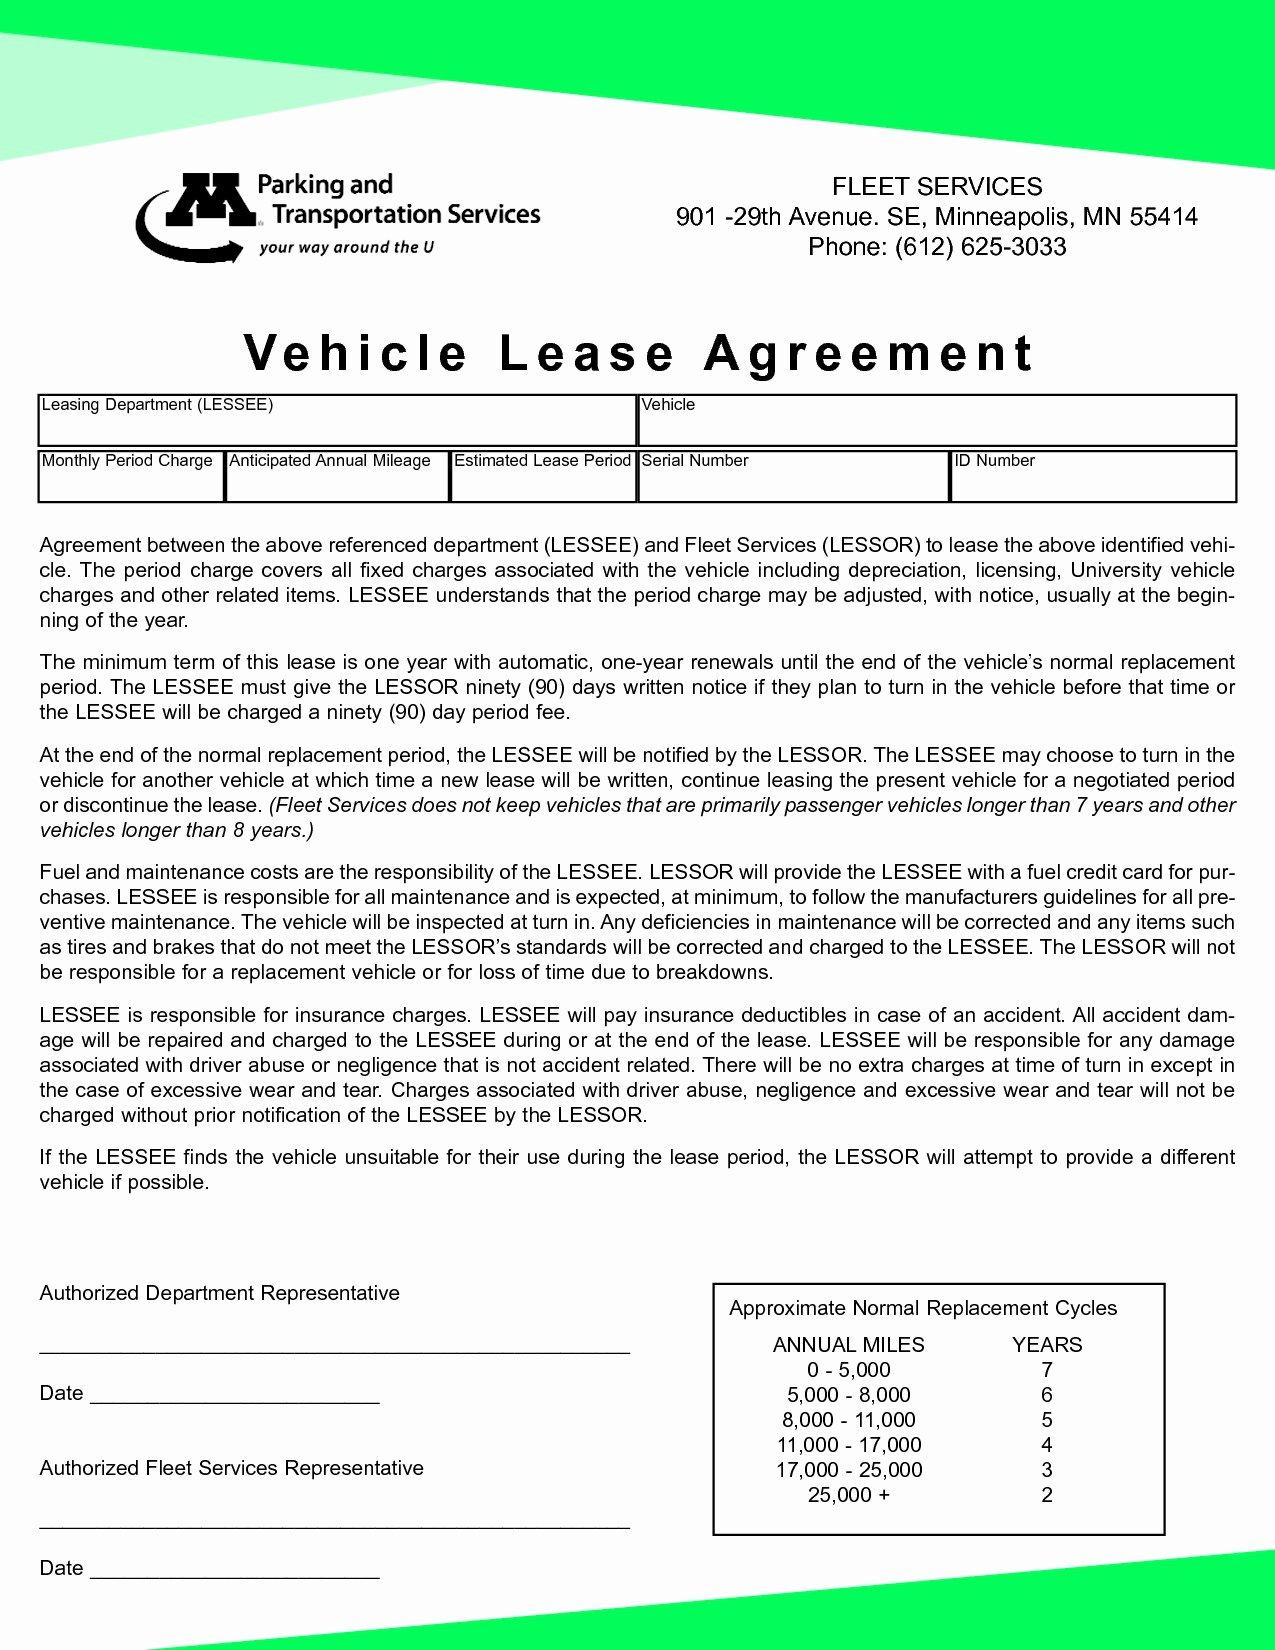 Car Lease Agreement Templates Fresh 24 Simple Auto Leaseback Agreement Template Eo E